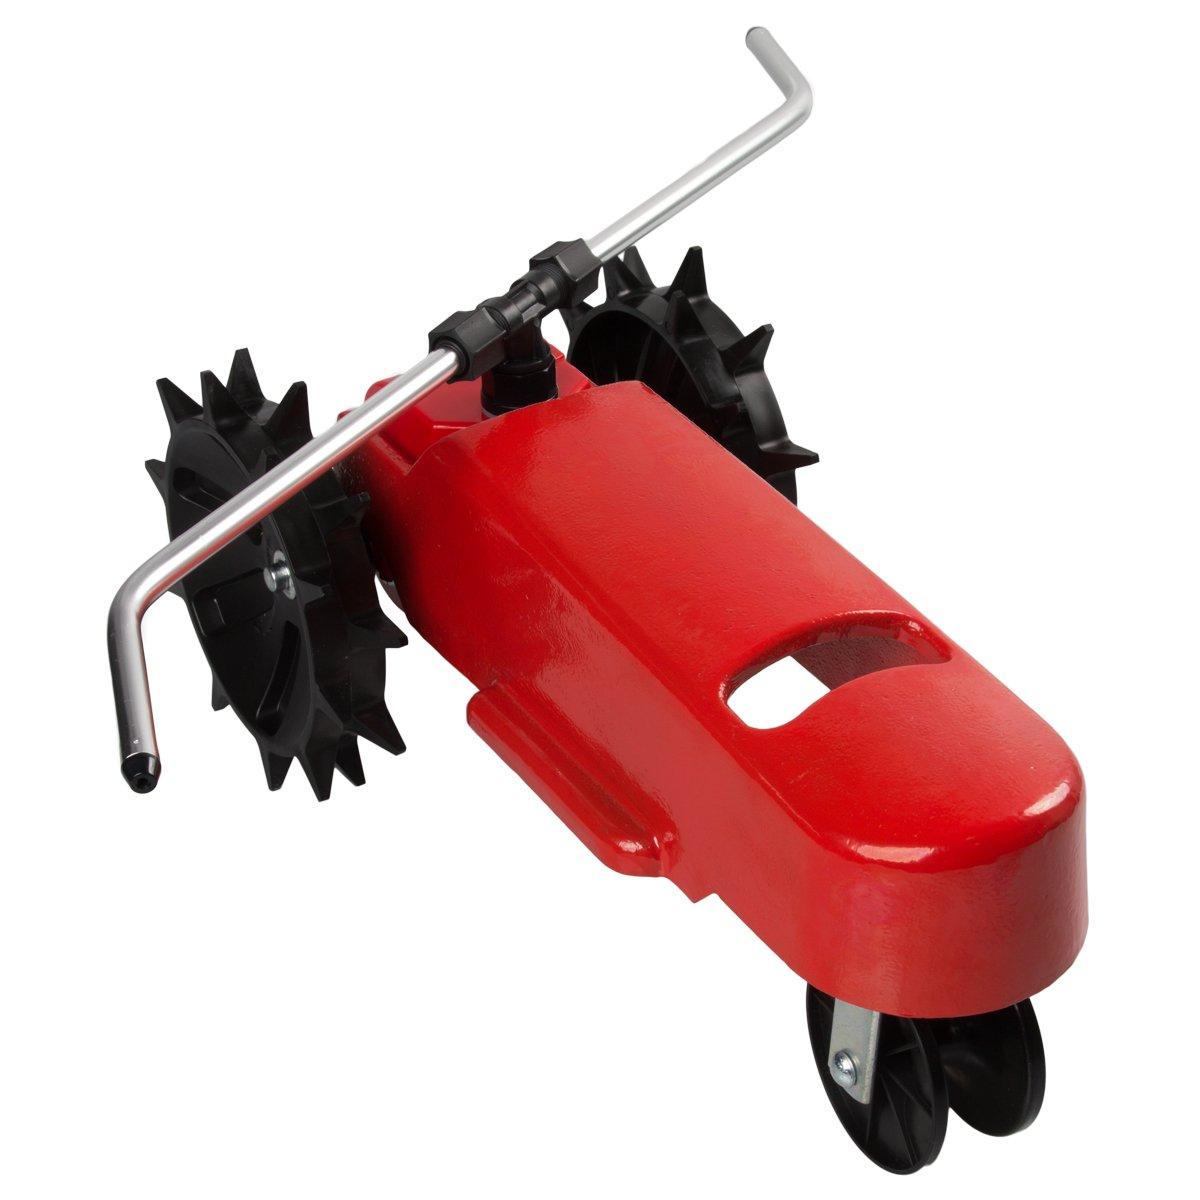 Tractor Sprinkler Shut Off : Best traveling sprinklers reviewed in nelson